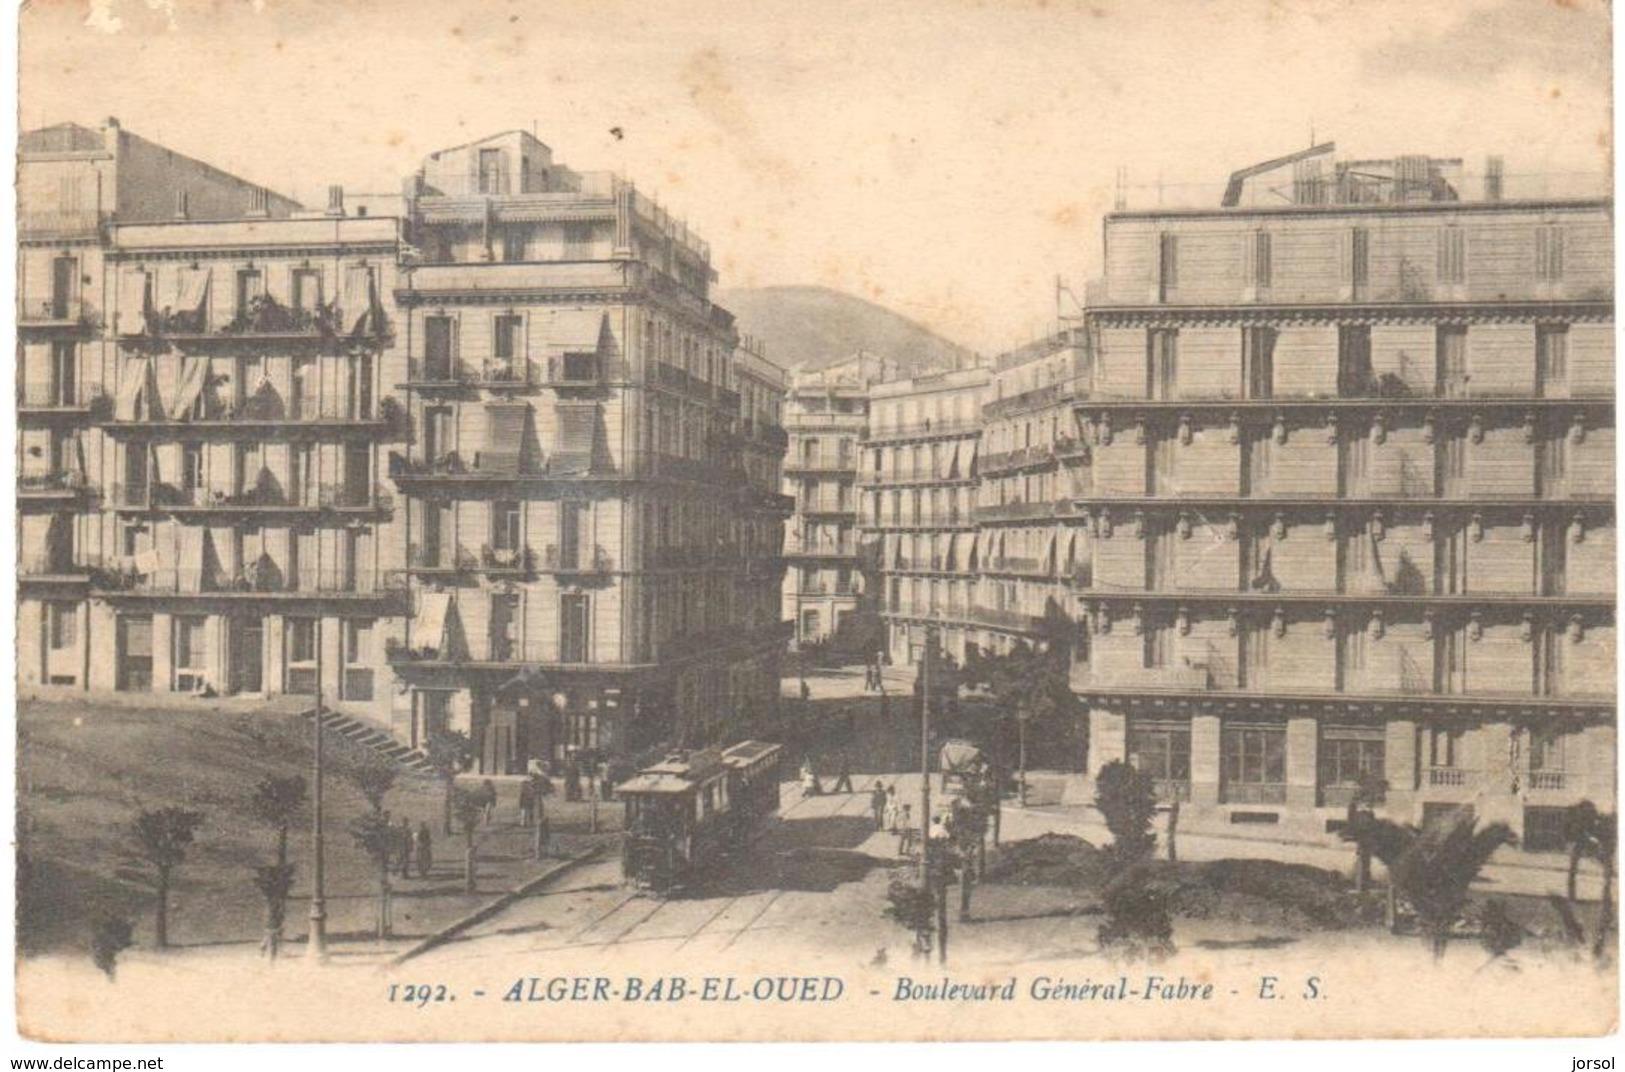 POSTAL   ALGER-BAB-EL-OUED  -ARGELIA  - BOULEVARD GÉNÉRAL-FABRE - Otros